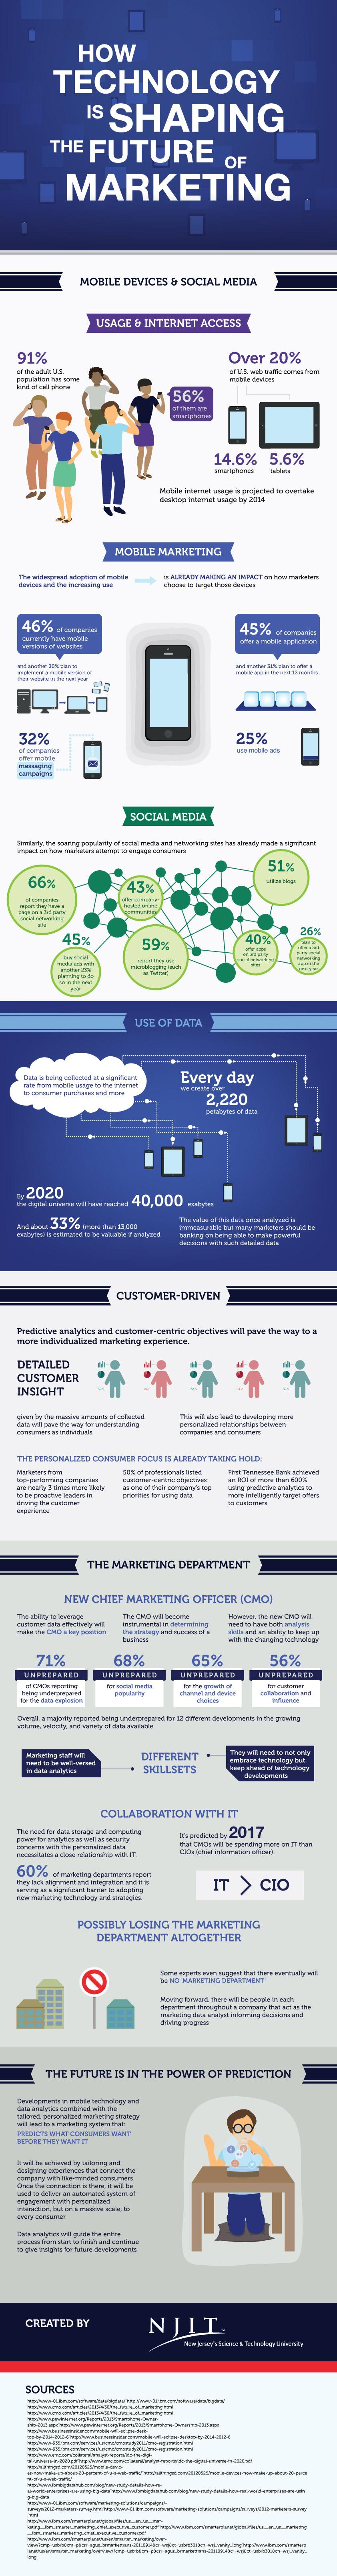 1395076175-win-marketing-scrap-marketing-department-hire-data-geek-infographic